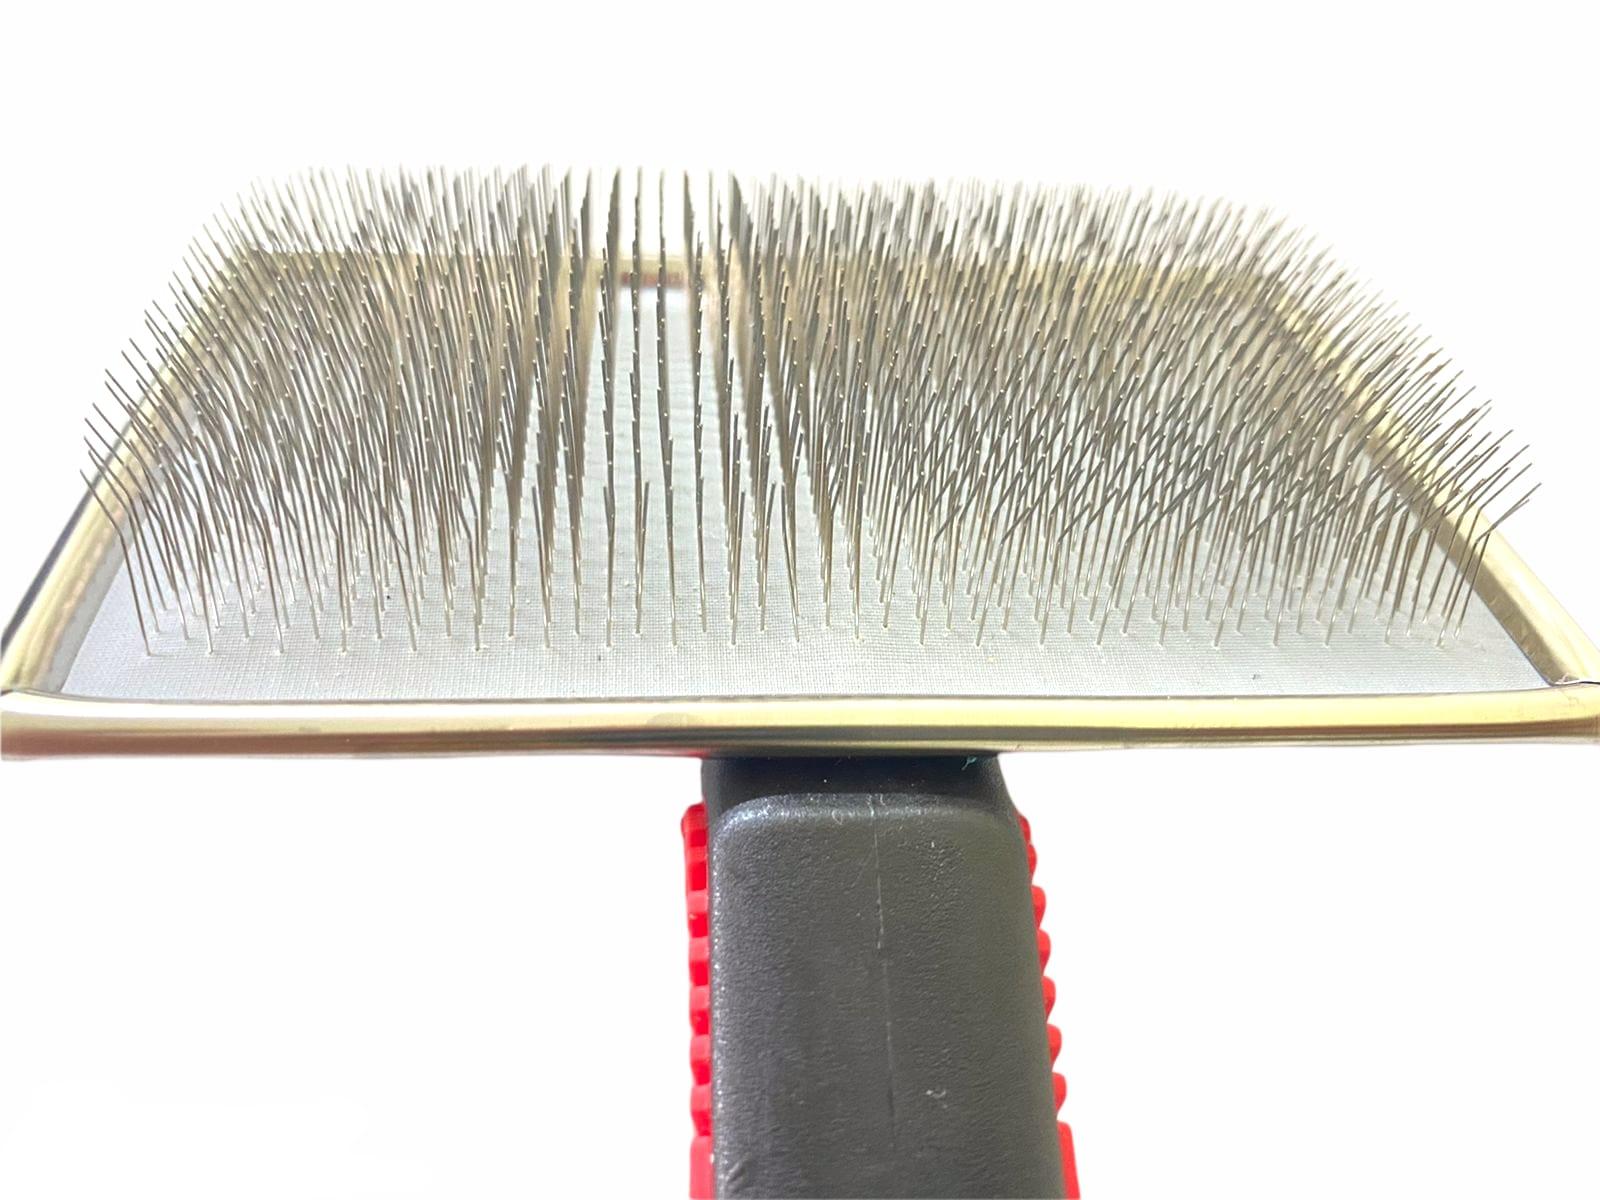 Rasqueadeira Curva grande- PRECISION EDGE